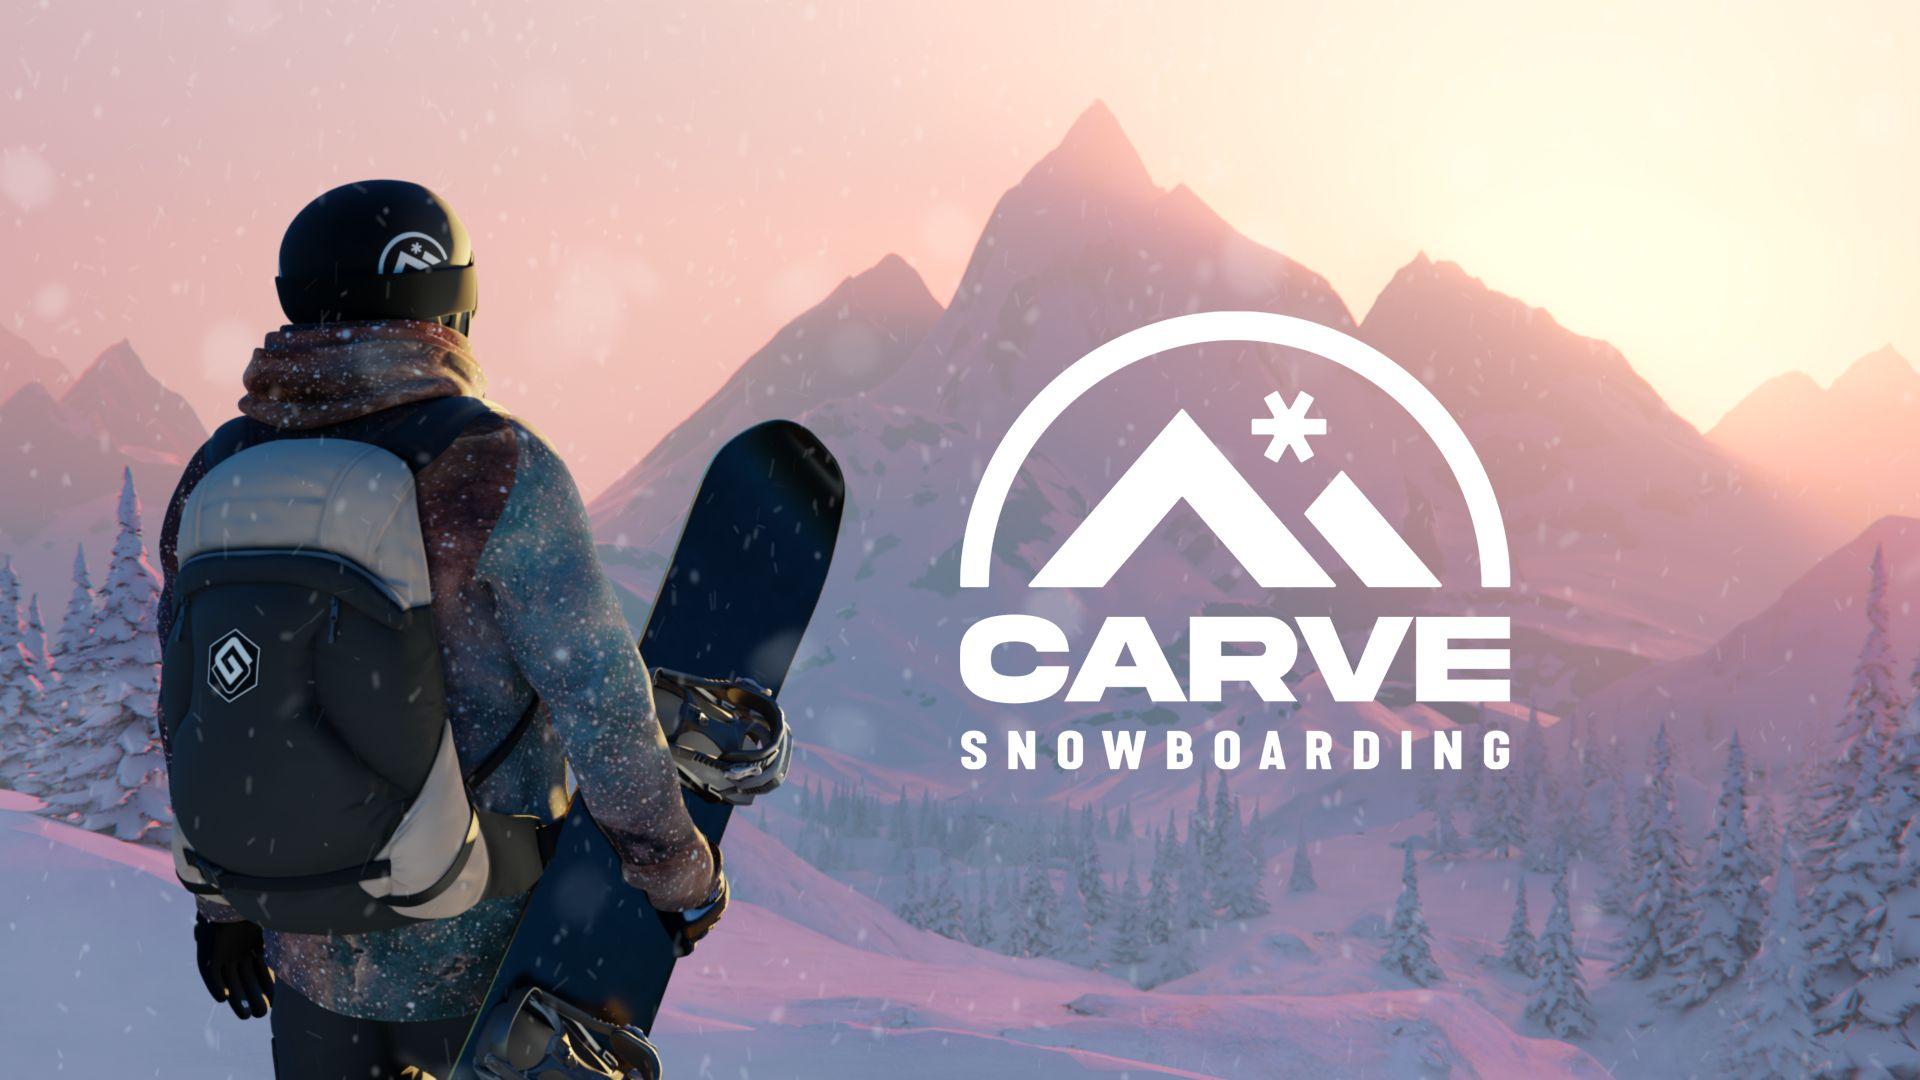 VRゲーム【Carve Snowboarding】まとめ《ボード経験者の感想》